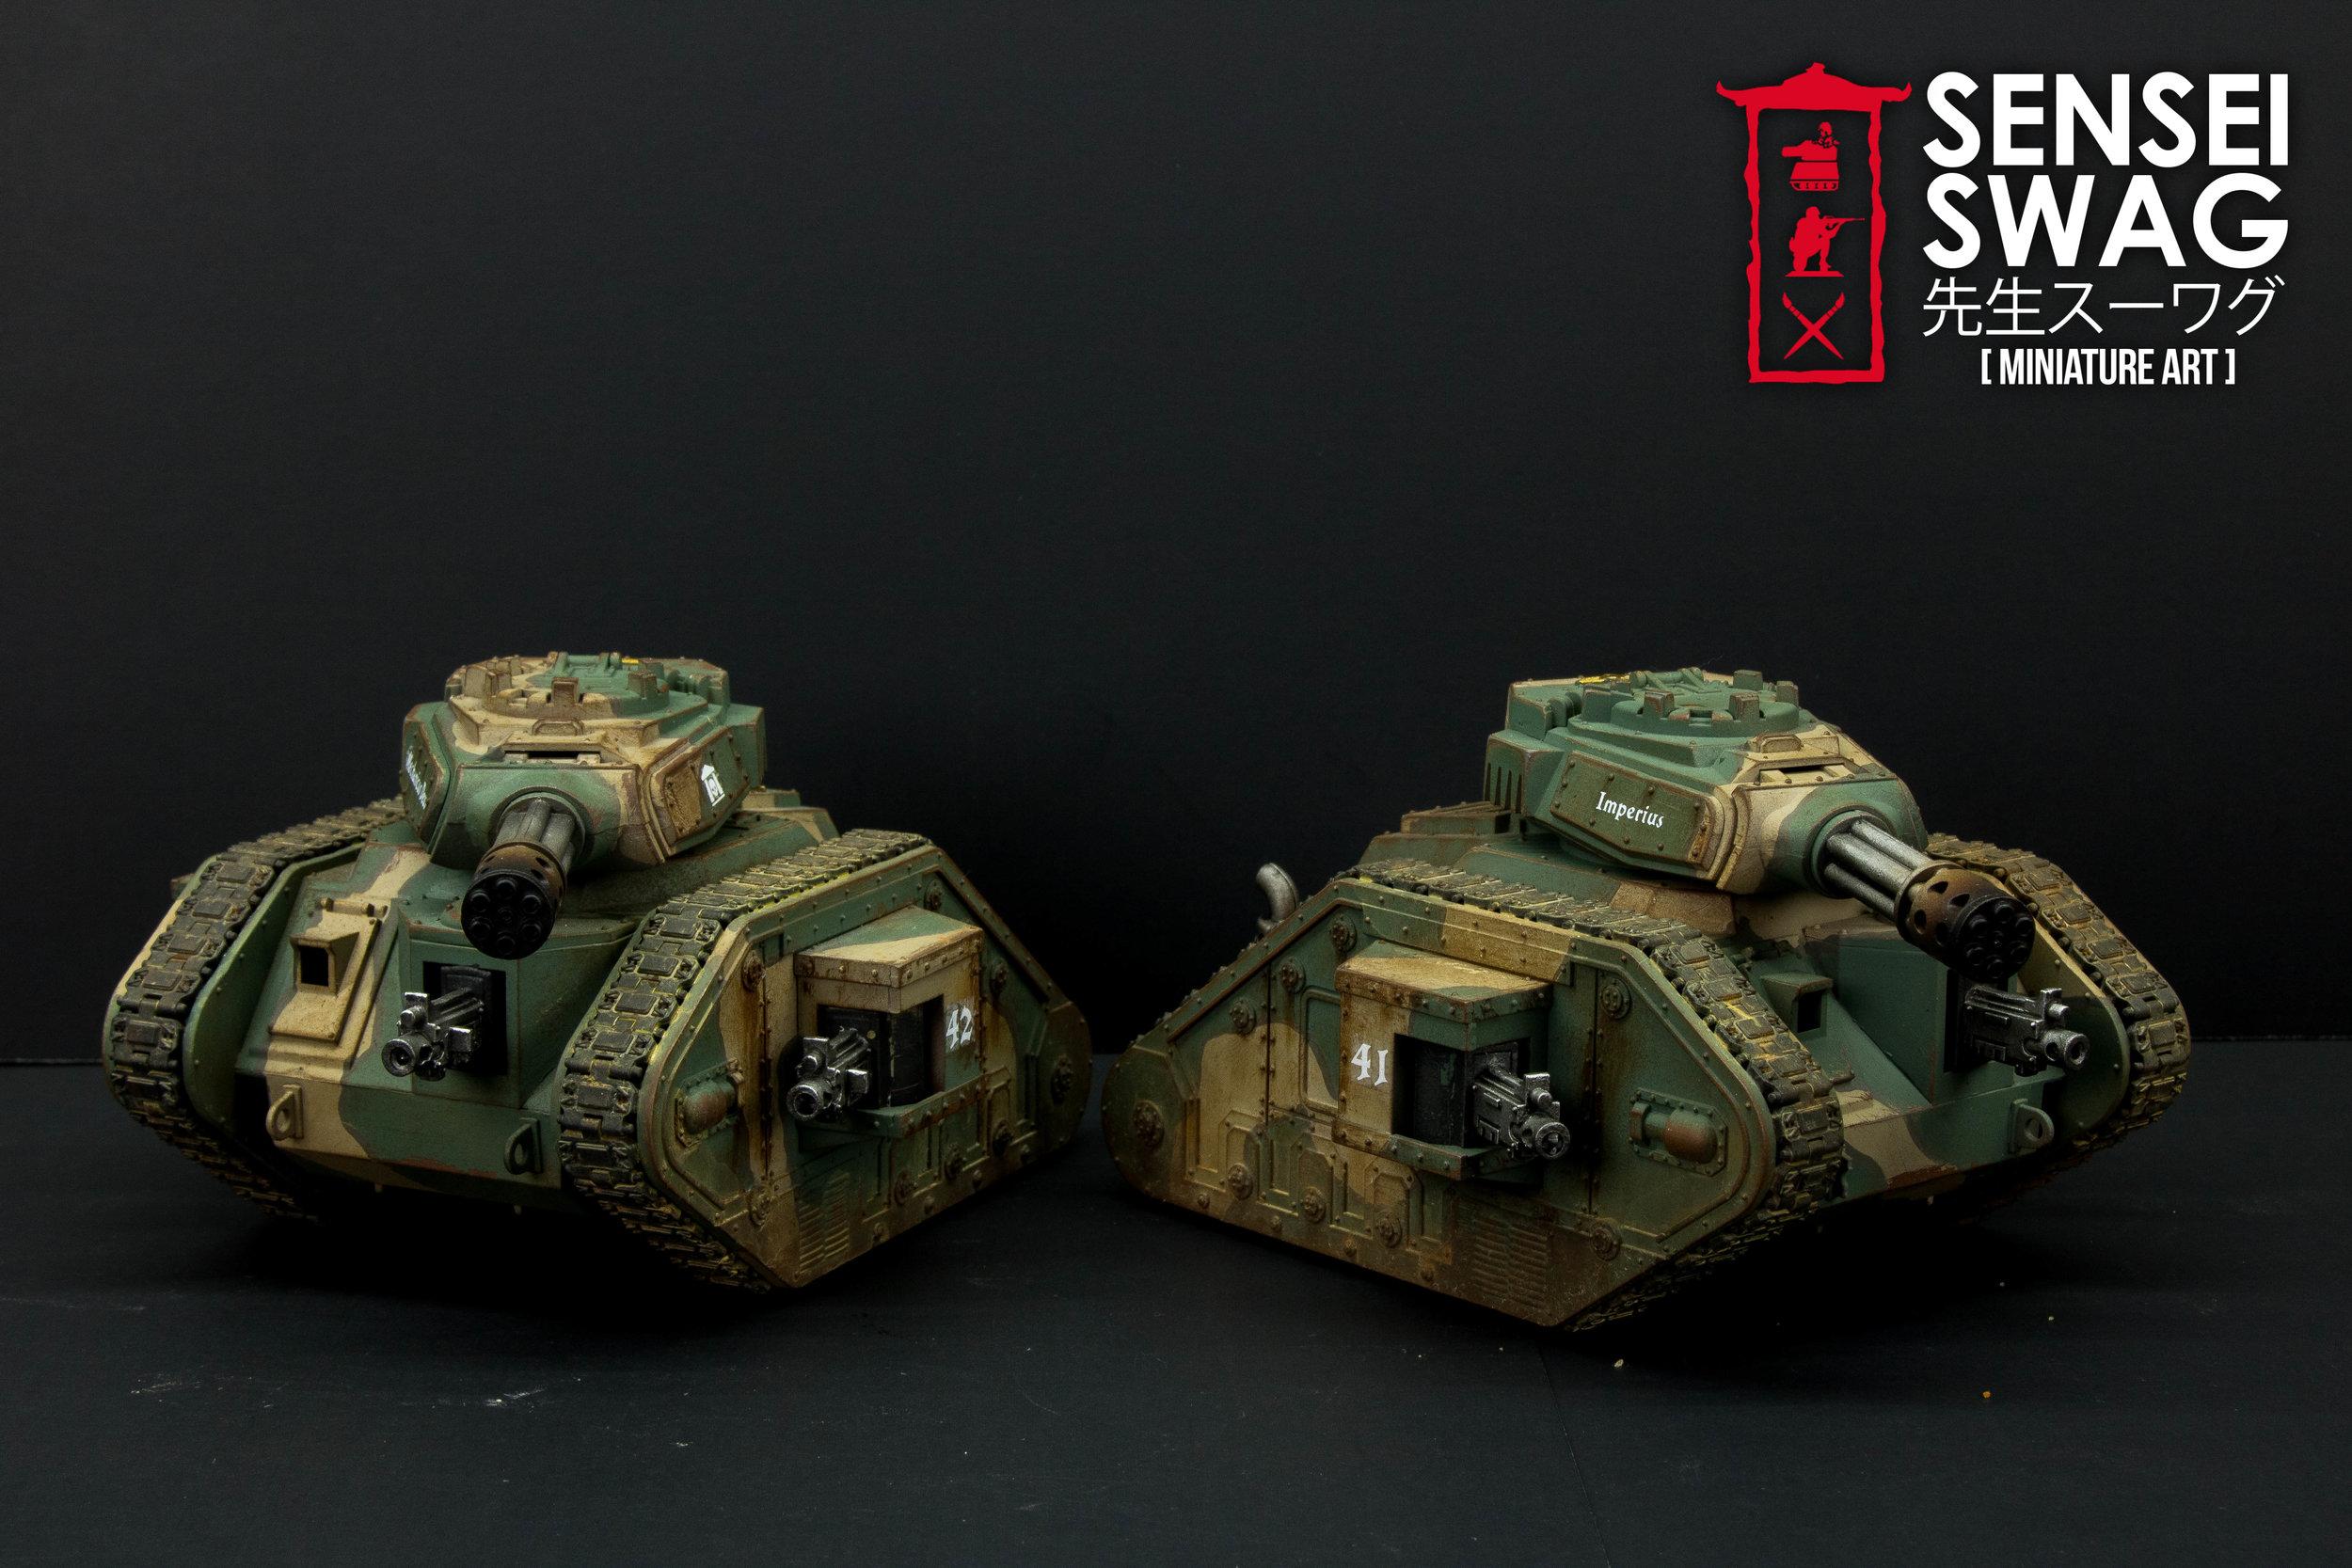 Cadian Armored Company Leman Russ 40k Tanks-3.jpg